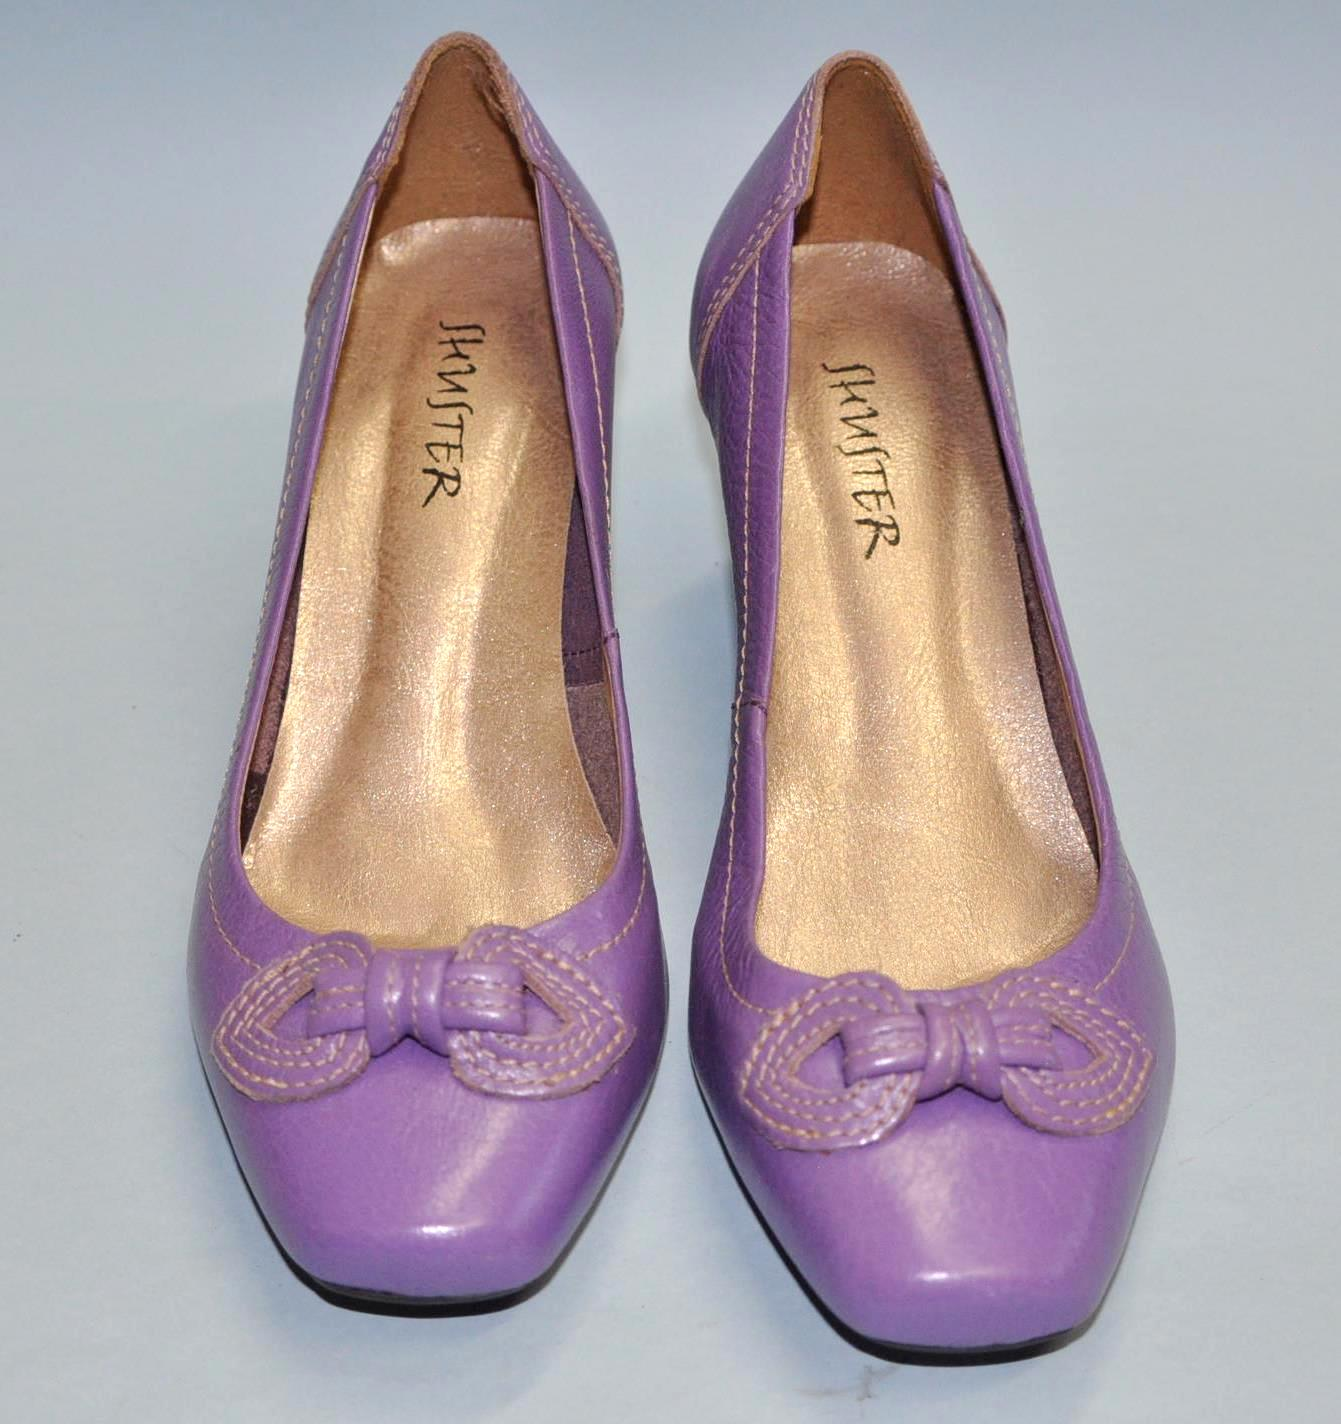 Sapato lilás numero 37 novo